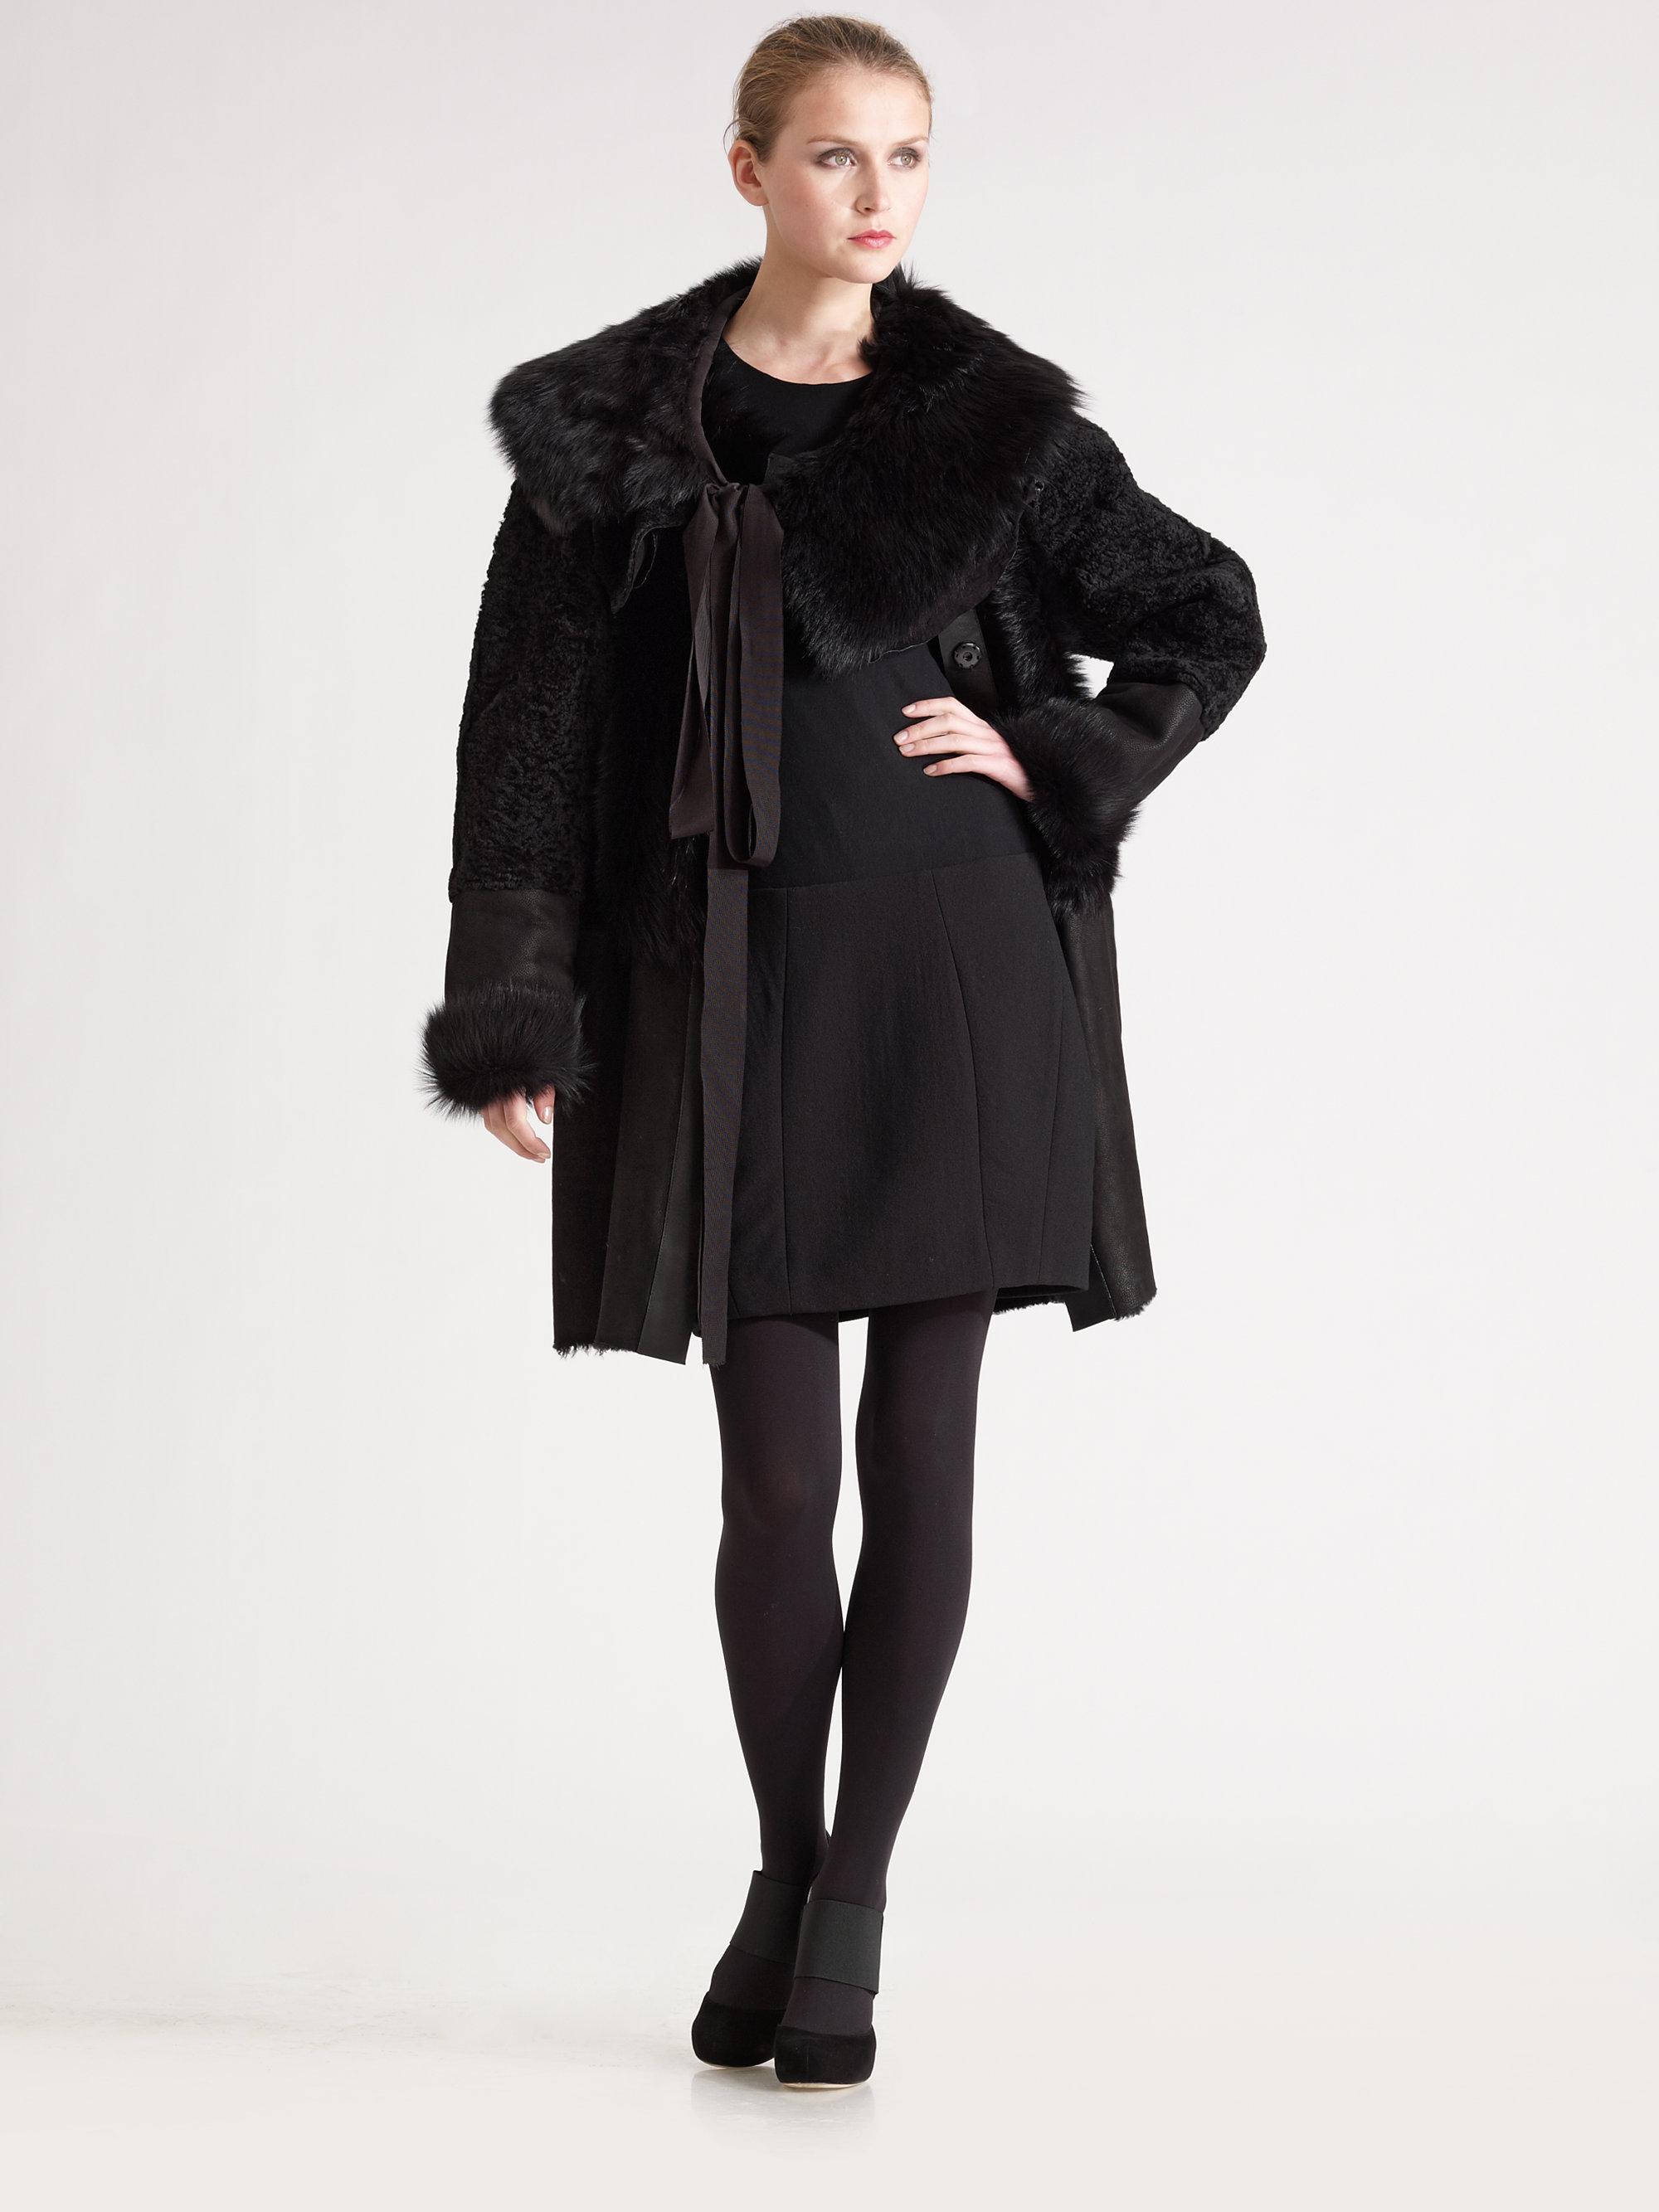 Donna karan Lamb Shearling Coat in Black | Lyst